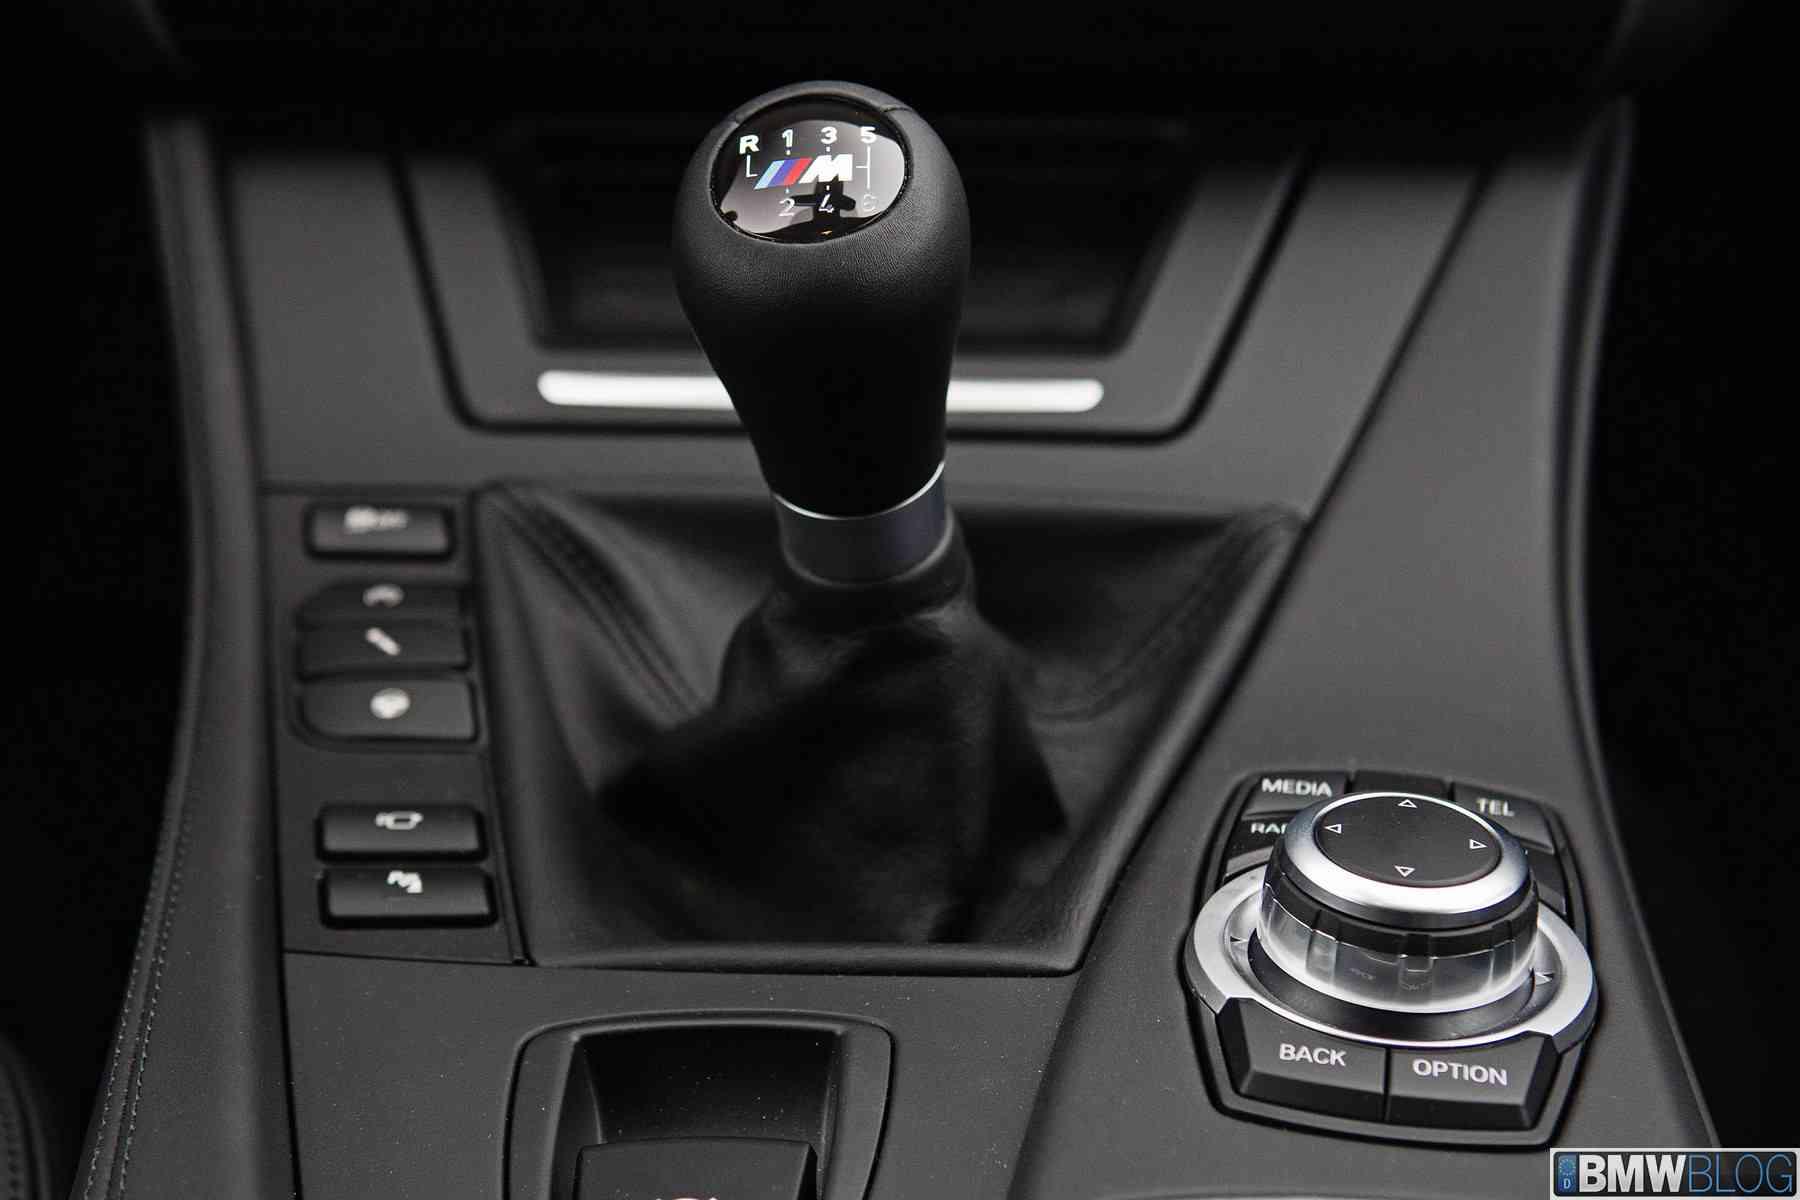 2013 bmw m5 manual review rh bmwblog com BMW 2002 4 Speed Manual Transmission BMW M4 Manual Transmission